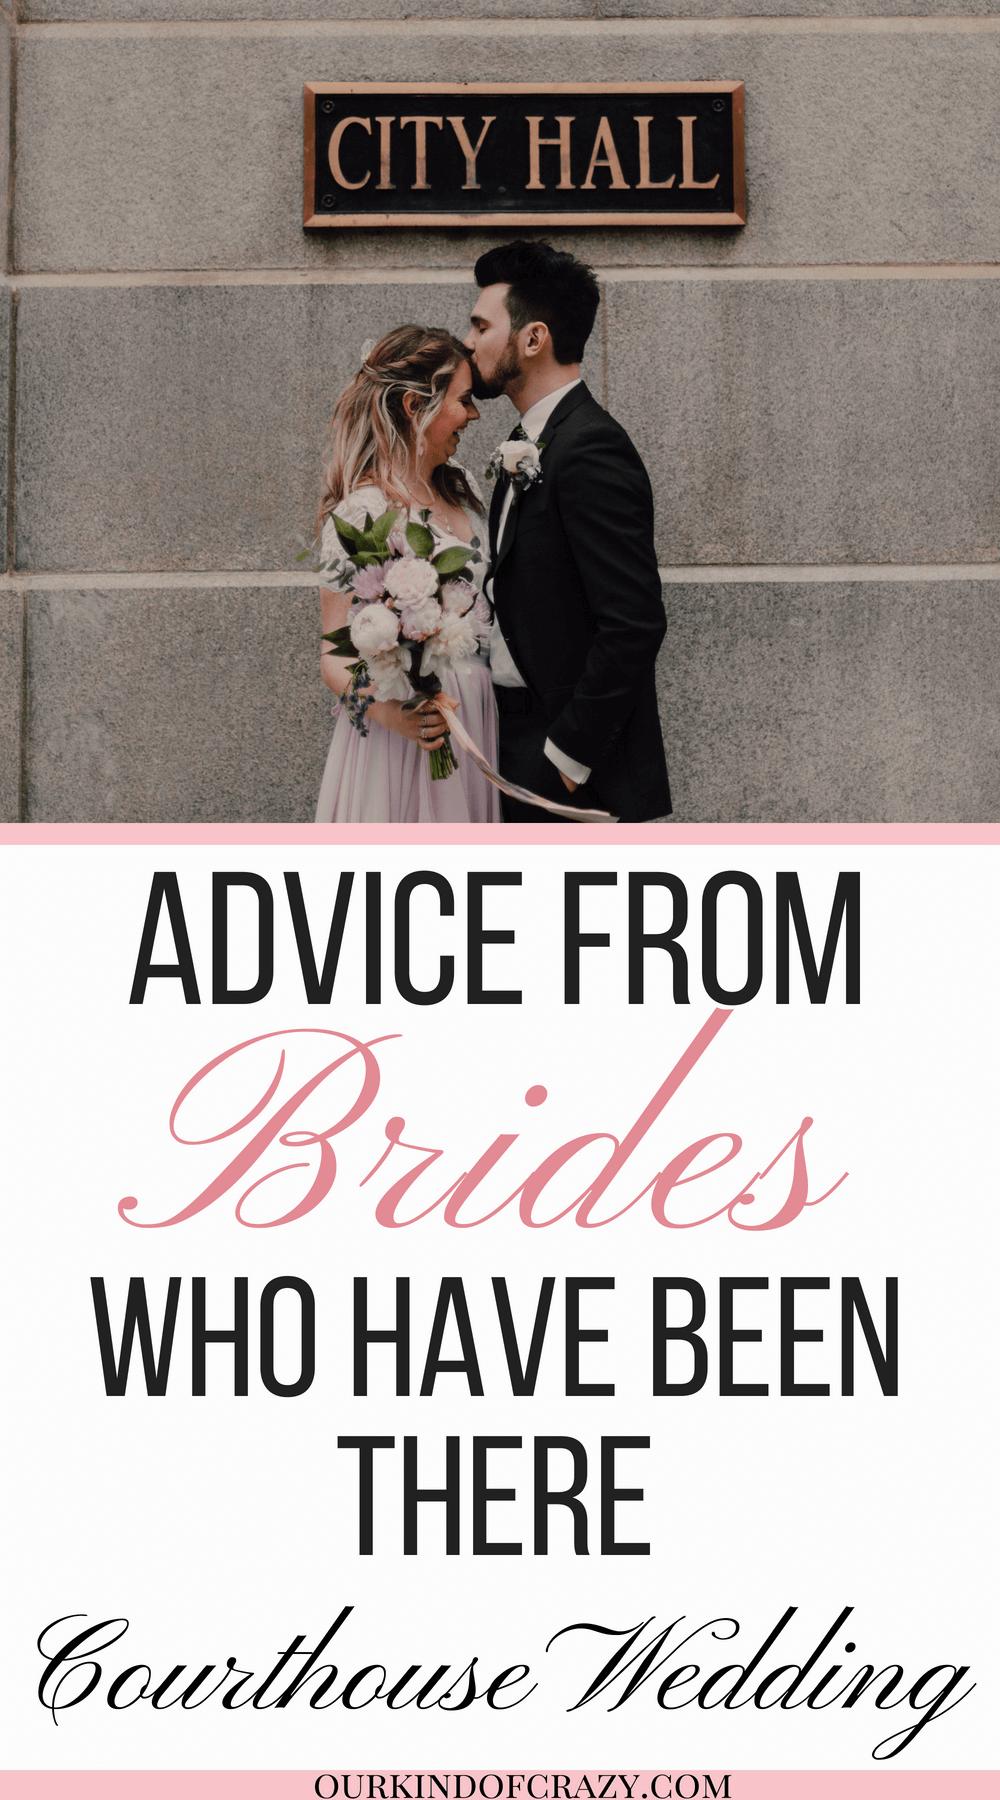 Courthouse Wedding Dress.Advice For Brides Having A Courthouse Wedding Plus Beautiful